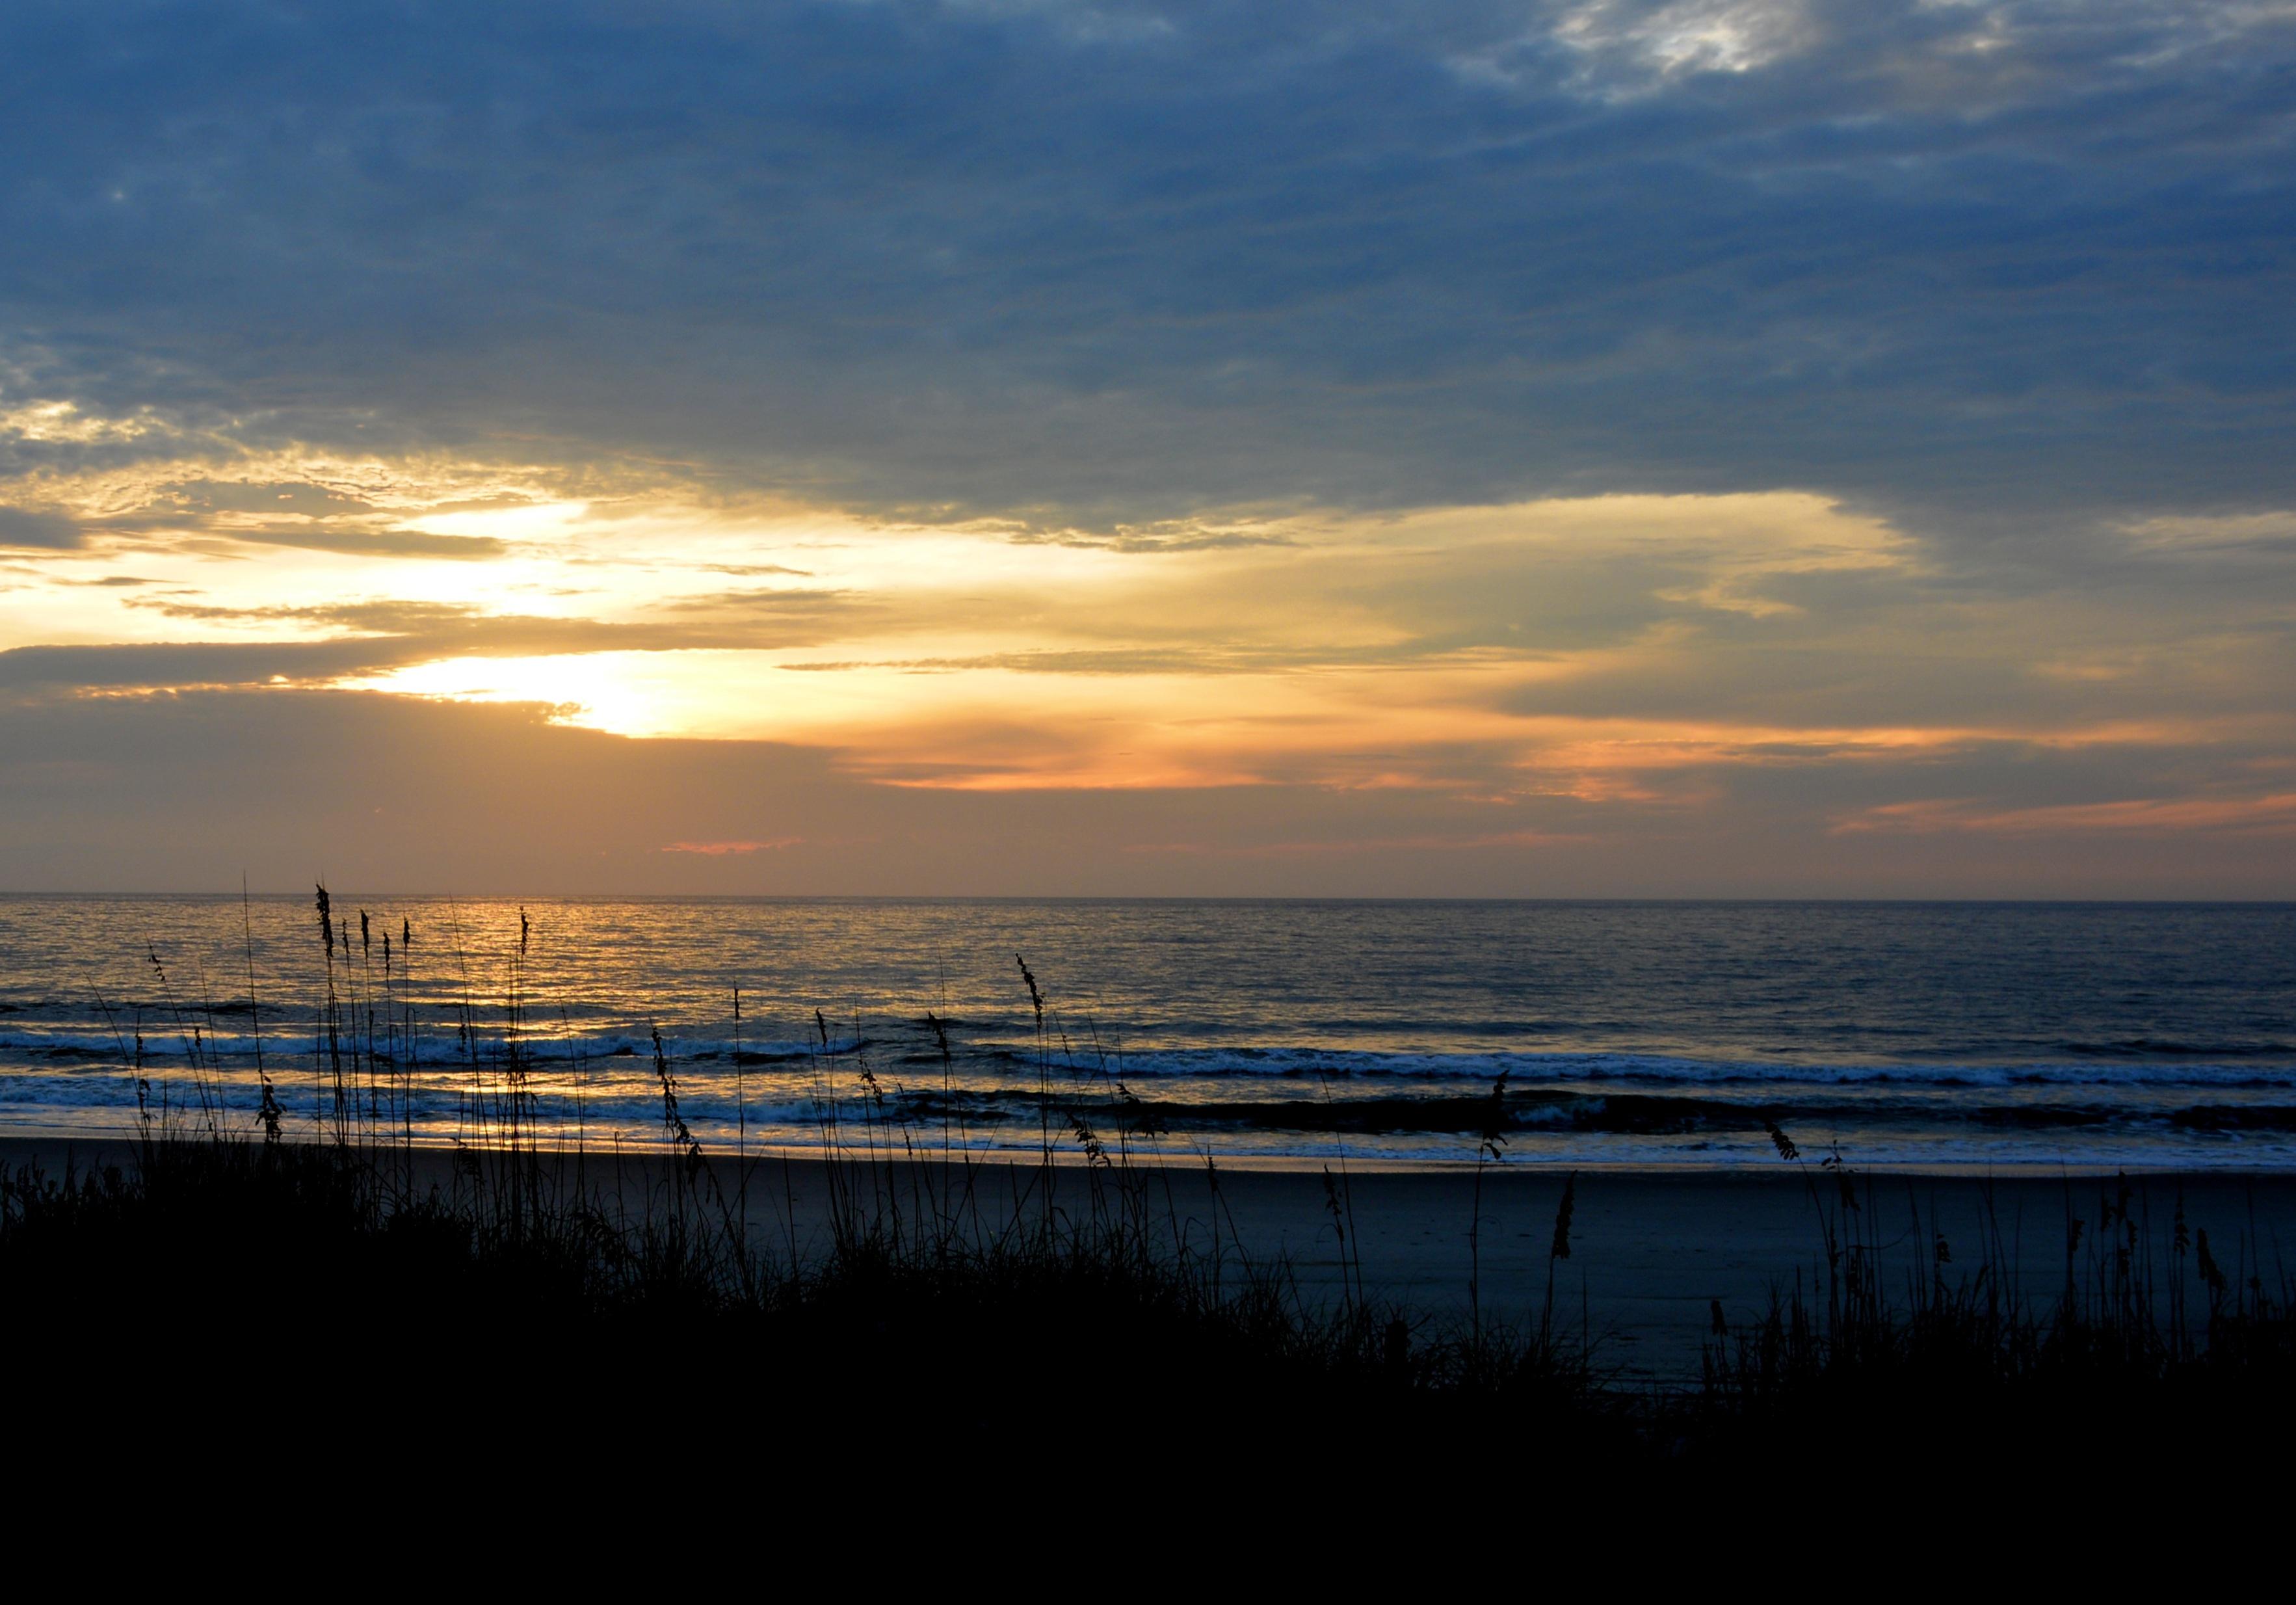 Free Images Beach Sea Coast Ocean Horizon Cloud Sky Sun Sunrise Sunset Sunlight Morning Shore Dawn Dusk Evening Reflection Bay